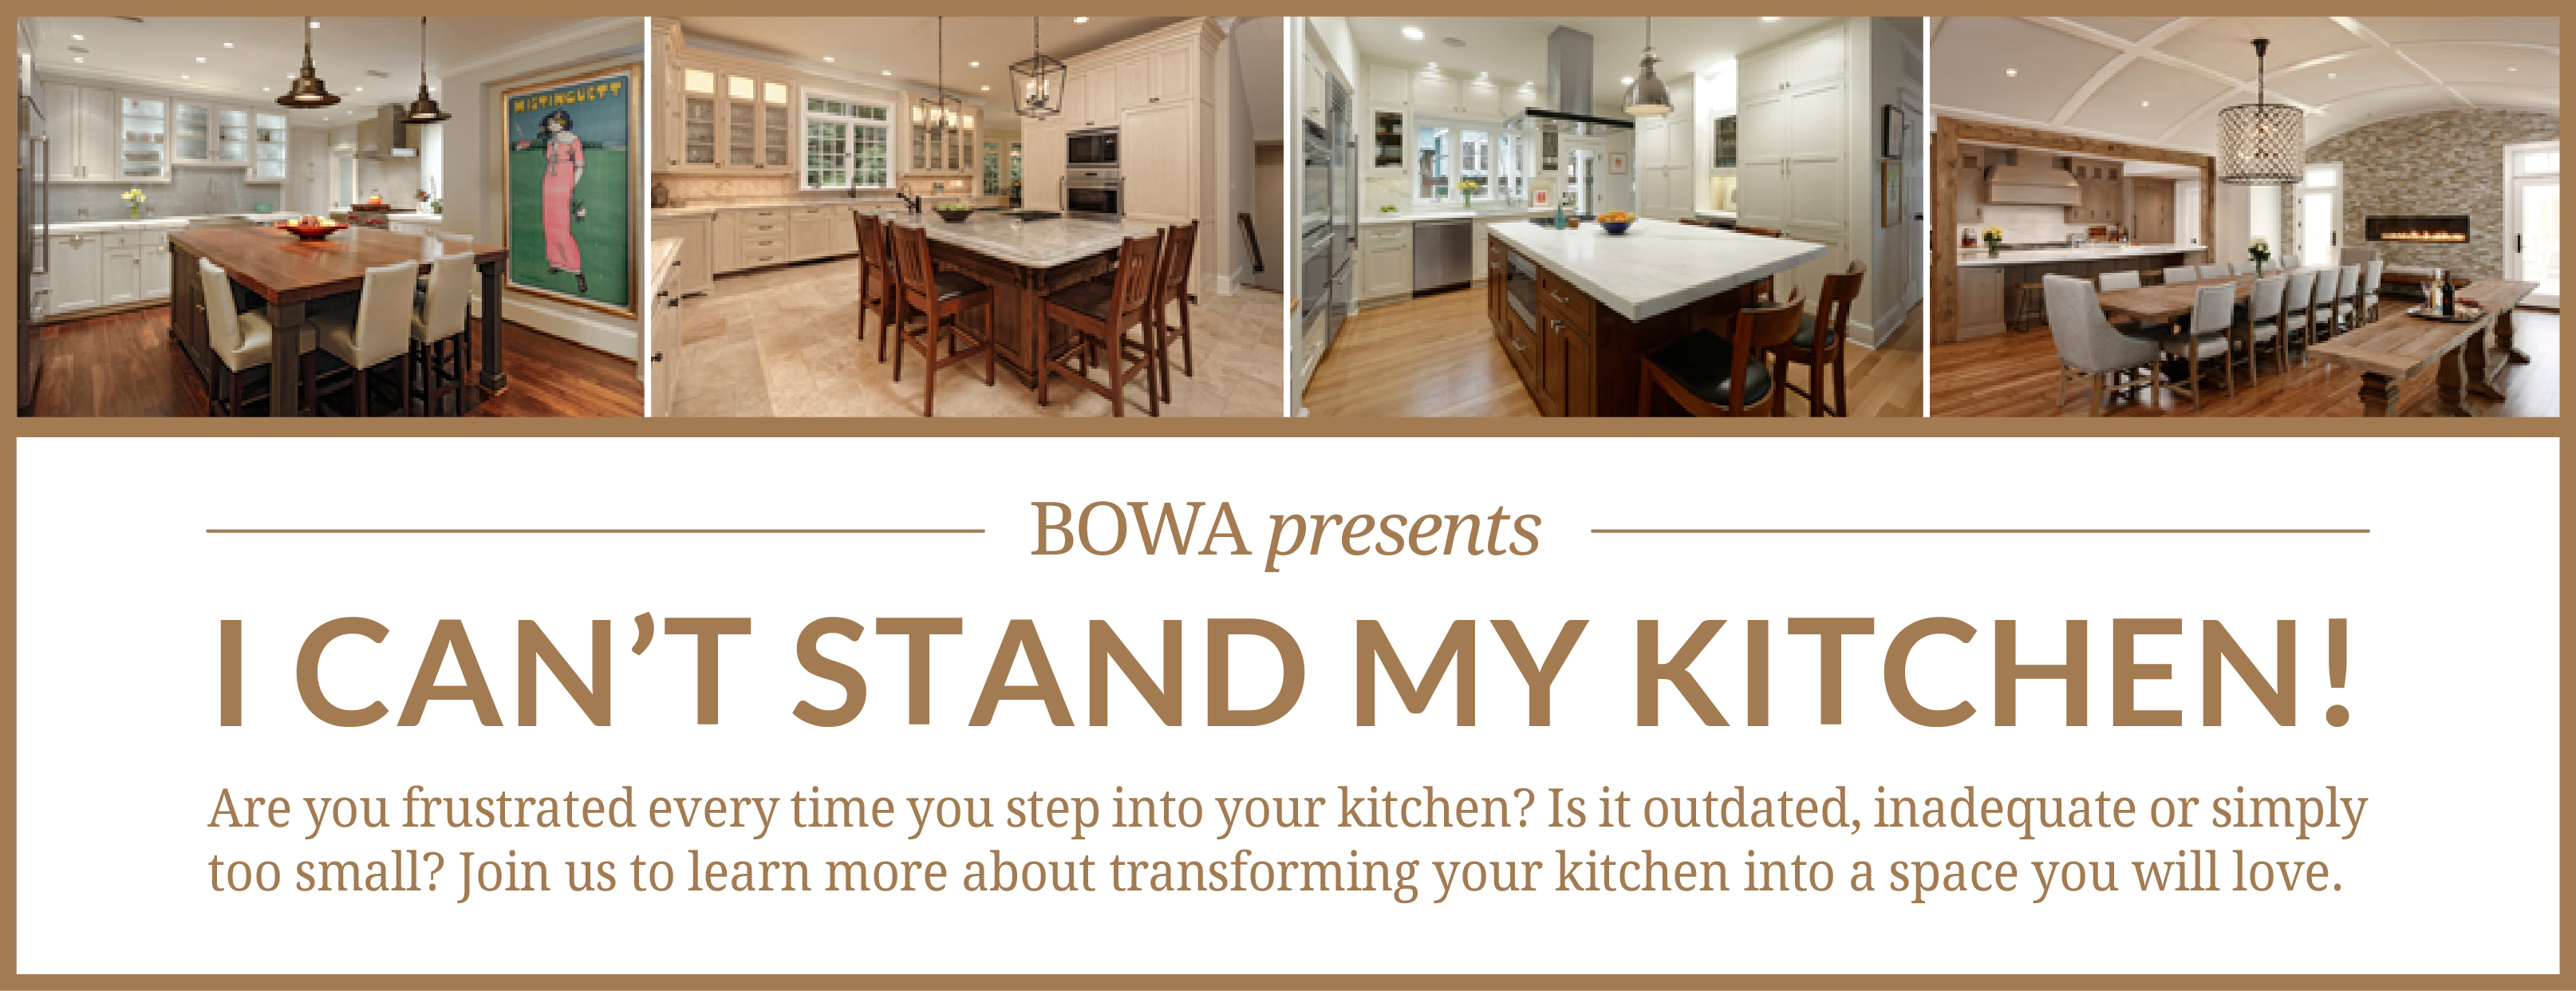 BOWA Kitchen Remodeling Seminar